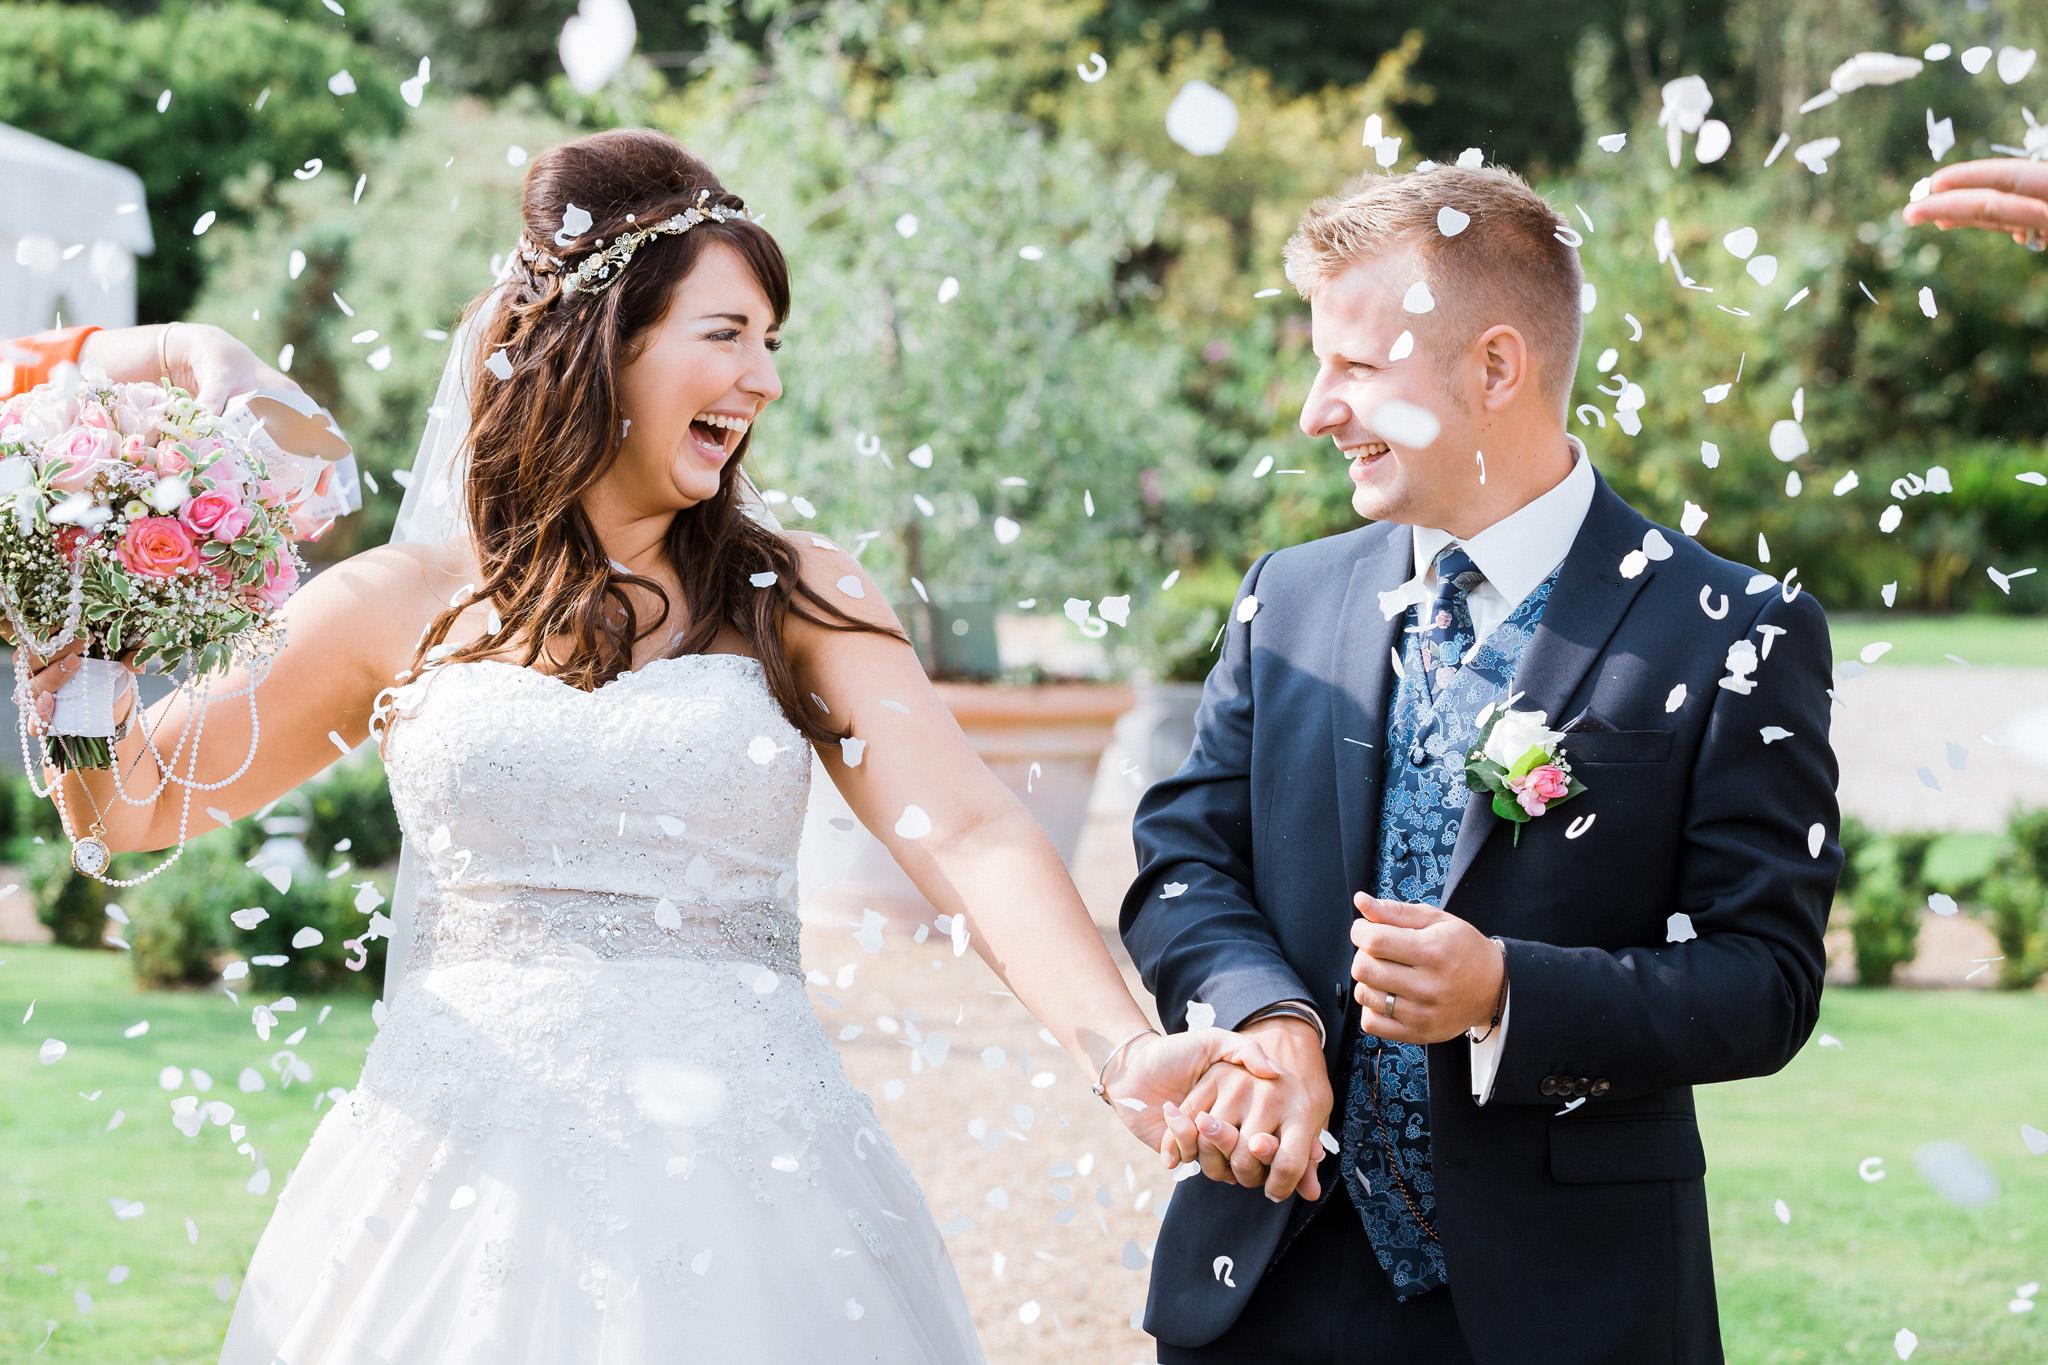 Kent - Wedding – The Secret Garden – Michelle & Sam – Confetti Throwing